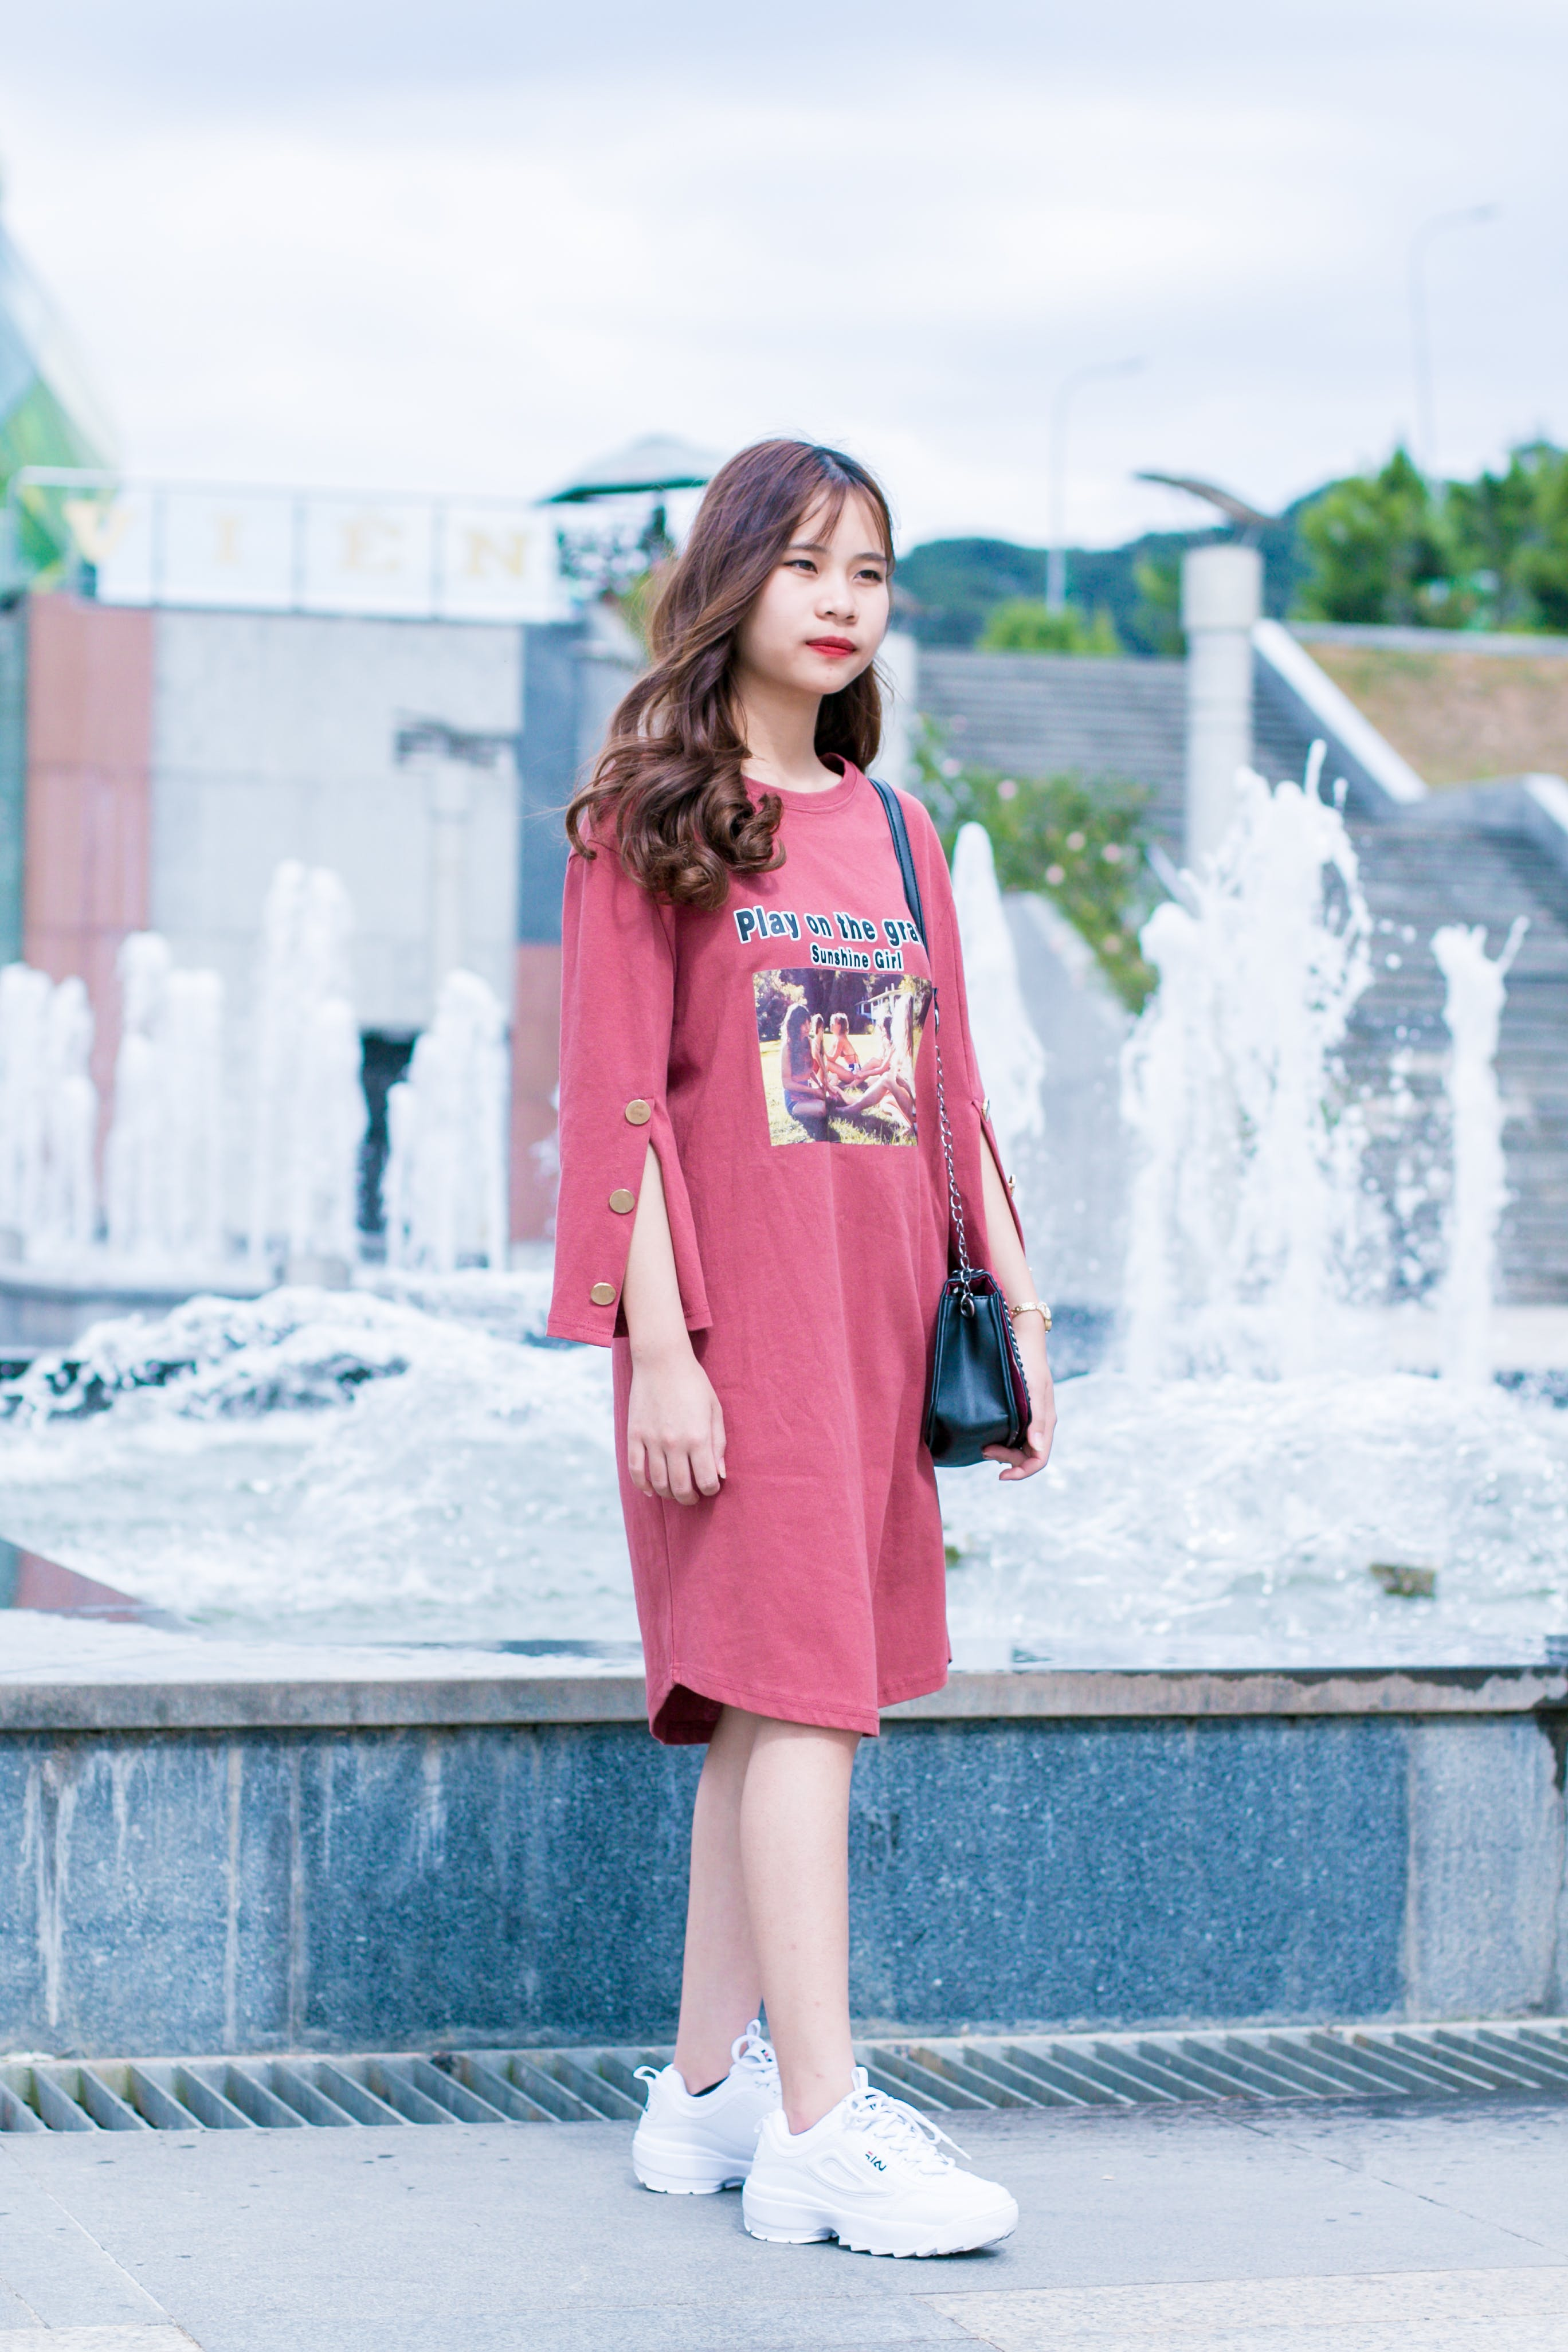 Woman Wearing Pink Dress Standing Near Water Fountain